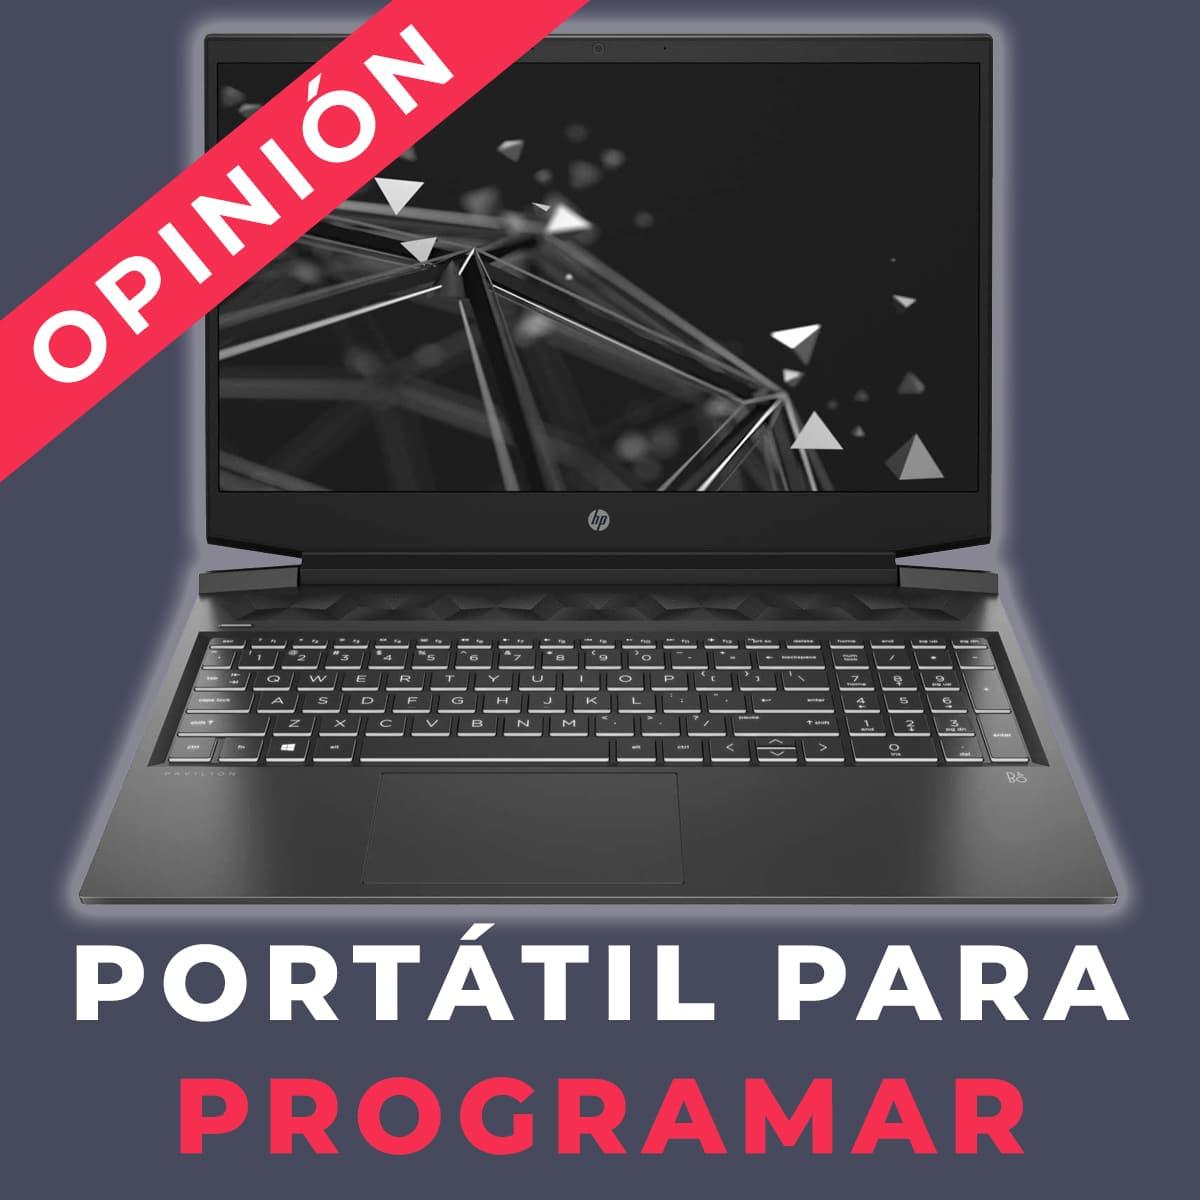 portatil para programar